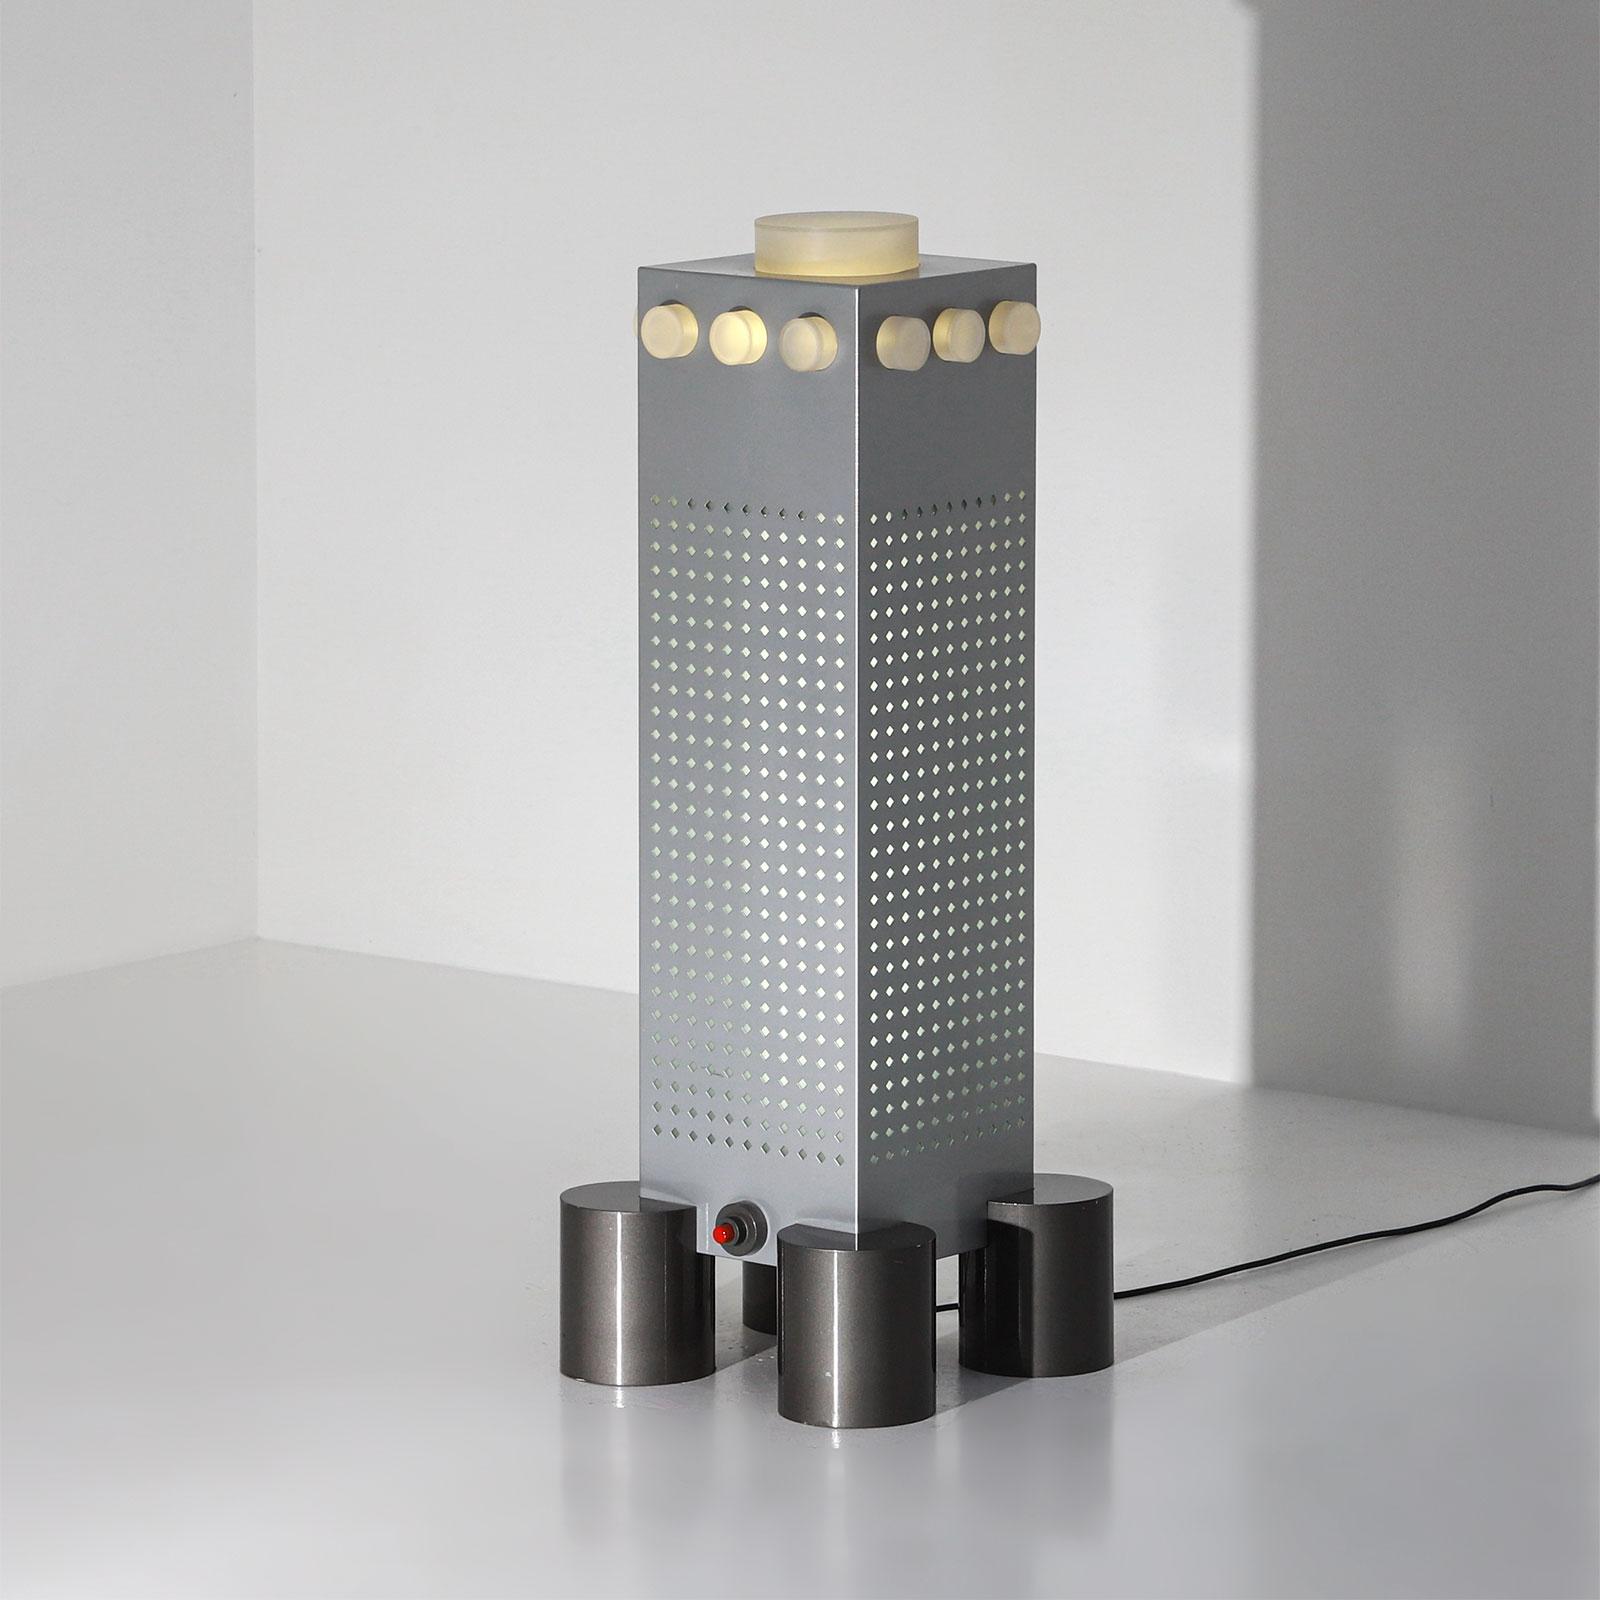 Matteo Thun & Andrea Lera wwf Tower Bieffeplast